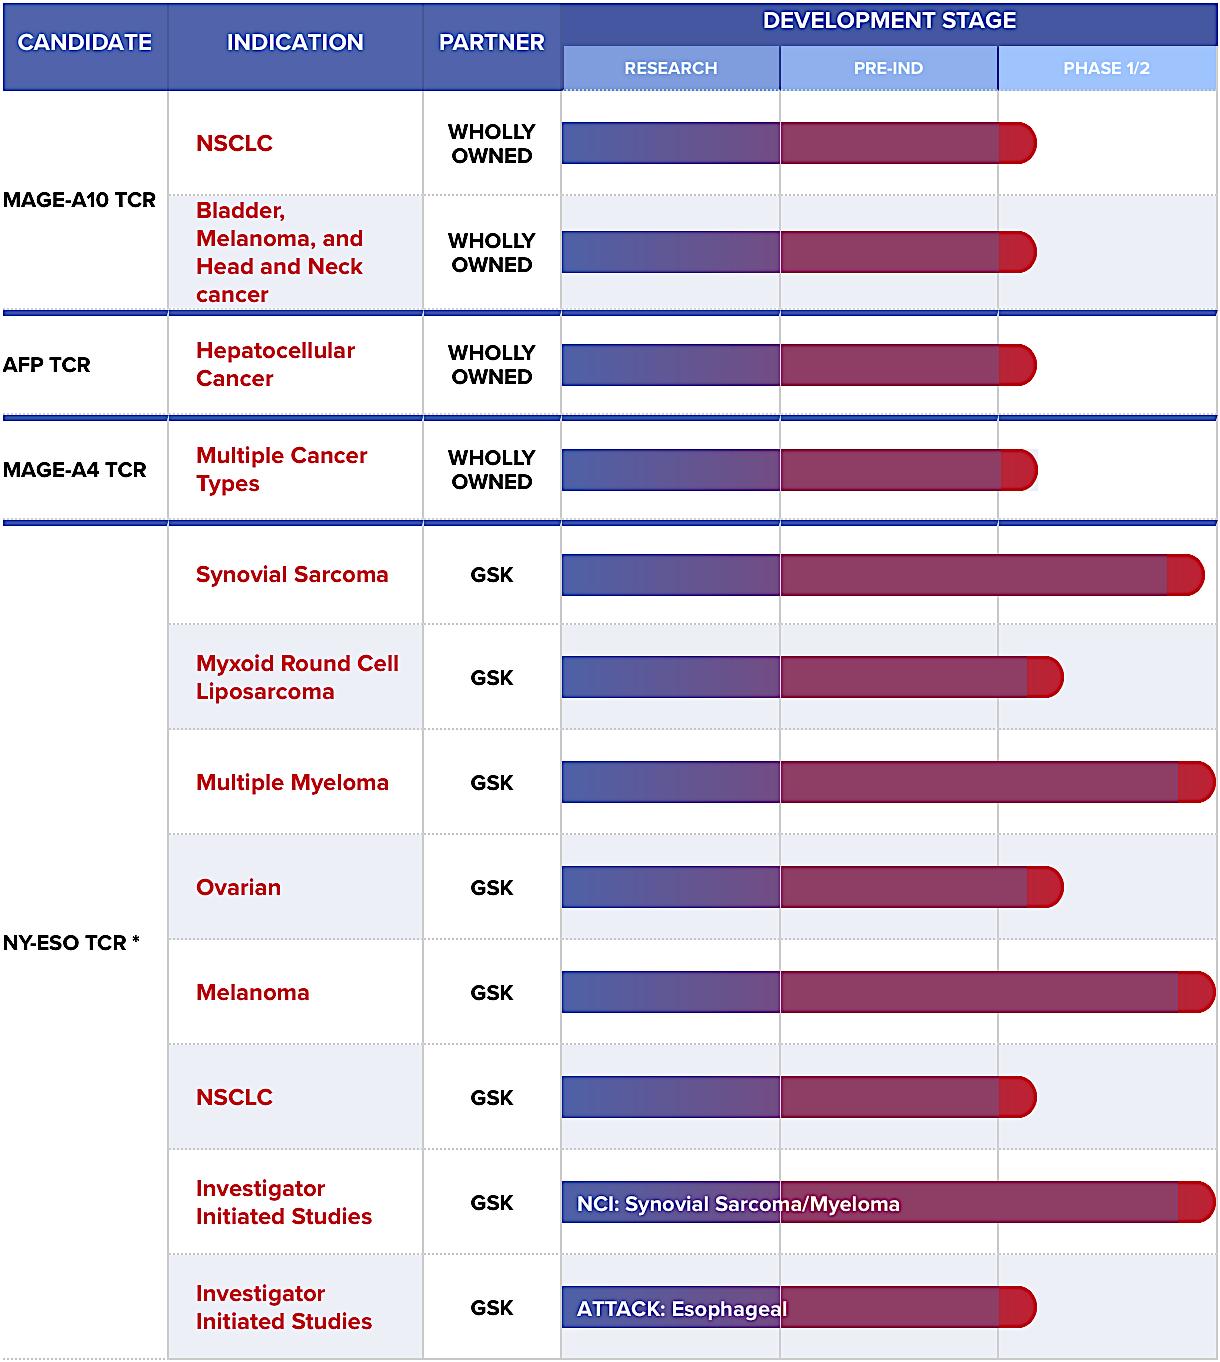 Gild gilead sciences inc crowdsourced stock ratings saupload3twzqxbpyiutogamjlvojb5m7lhamjozoilup b0d9np3pmvetwfuzdvsy6xuvs65ky94o k4pznnnymneckgohbnwtlw9f1lb2xsh2op1lihxl3qwhp5bexk1fufyoku82qcthumb1g biocorpaavc Gallery